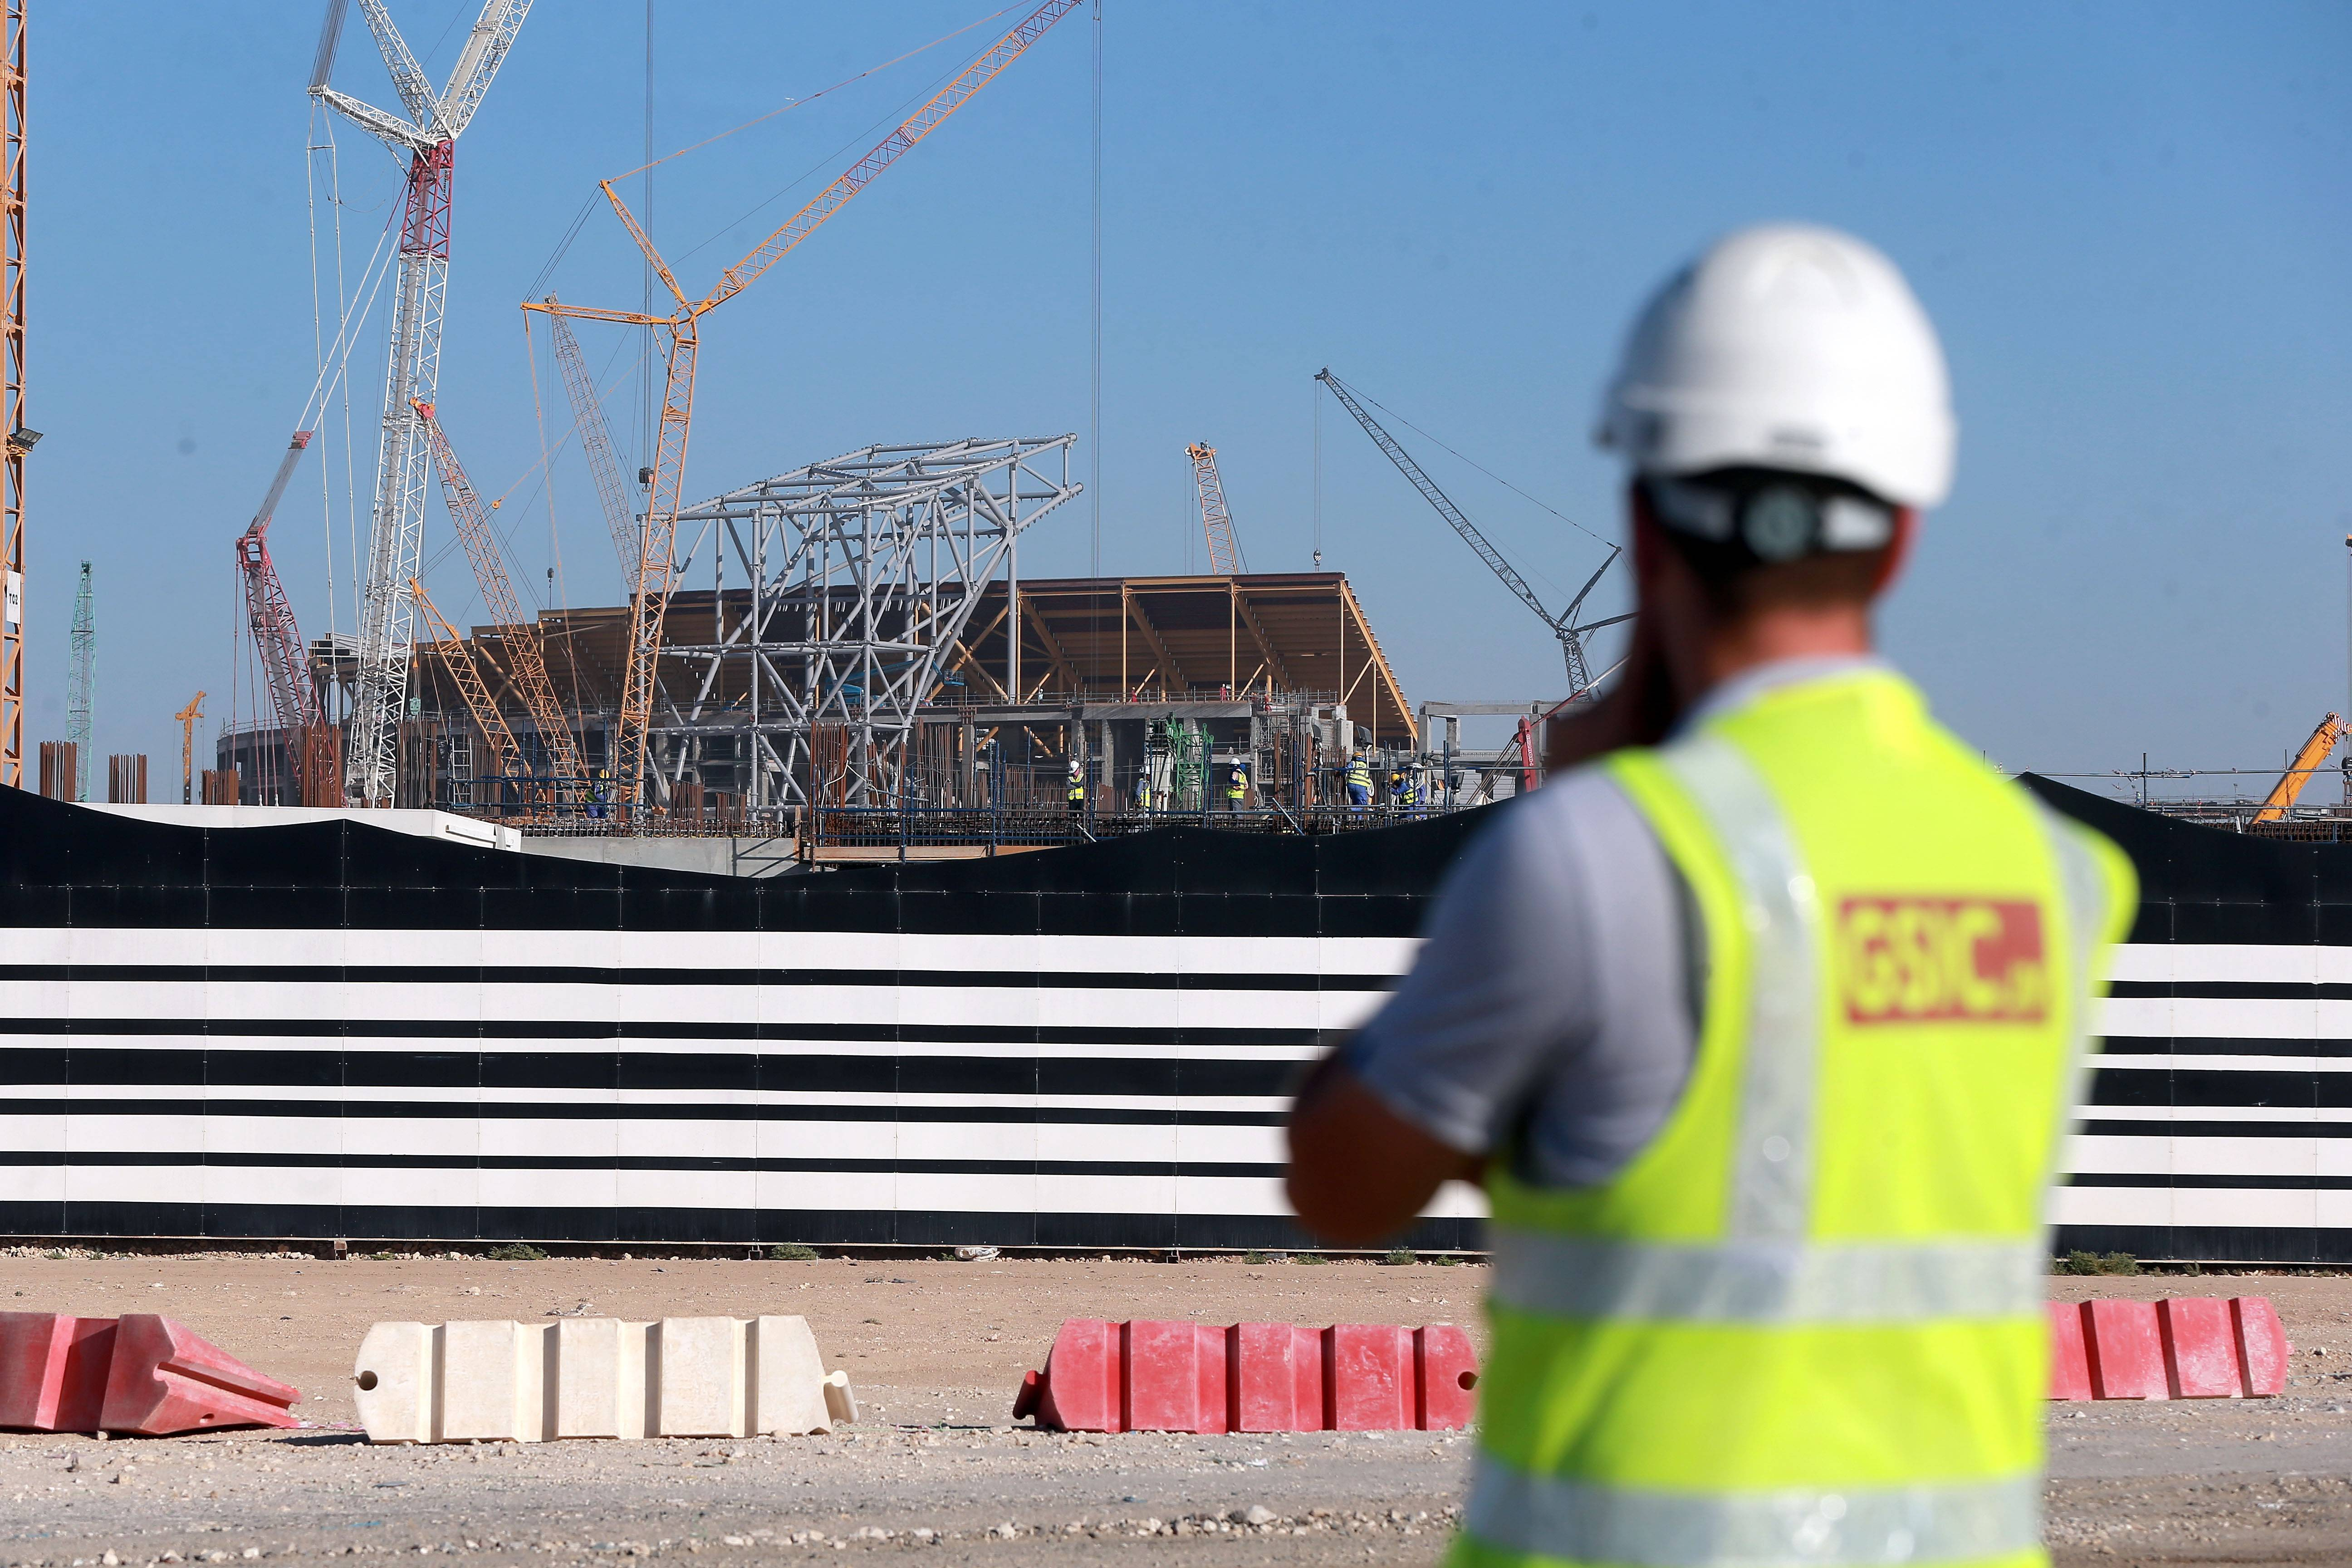 Latest report on worker welfare highlights Qatar 2022 progress, challenges